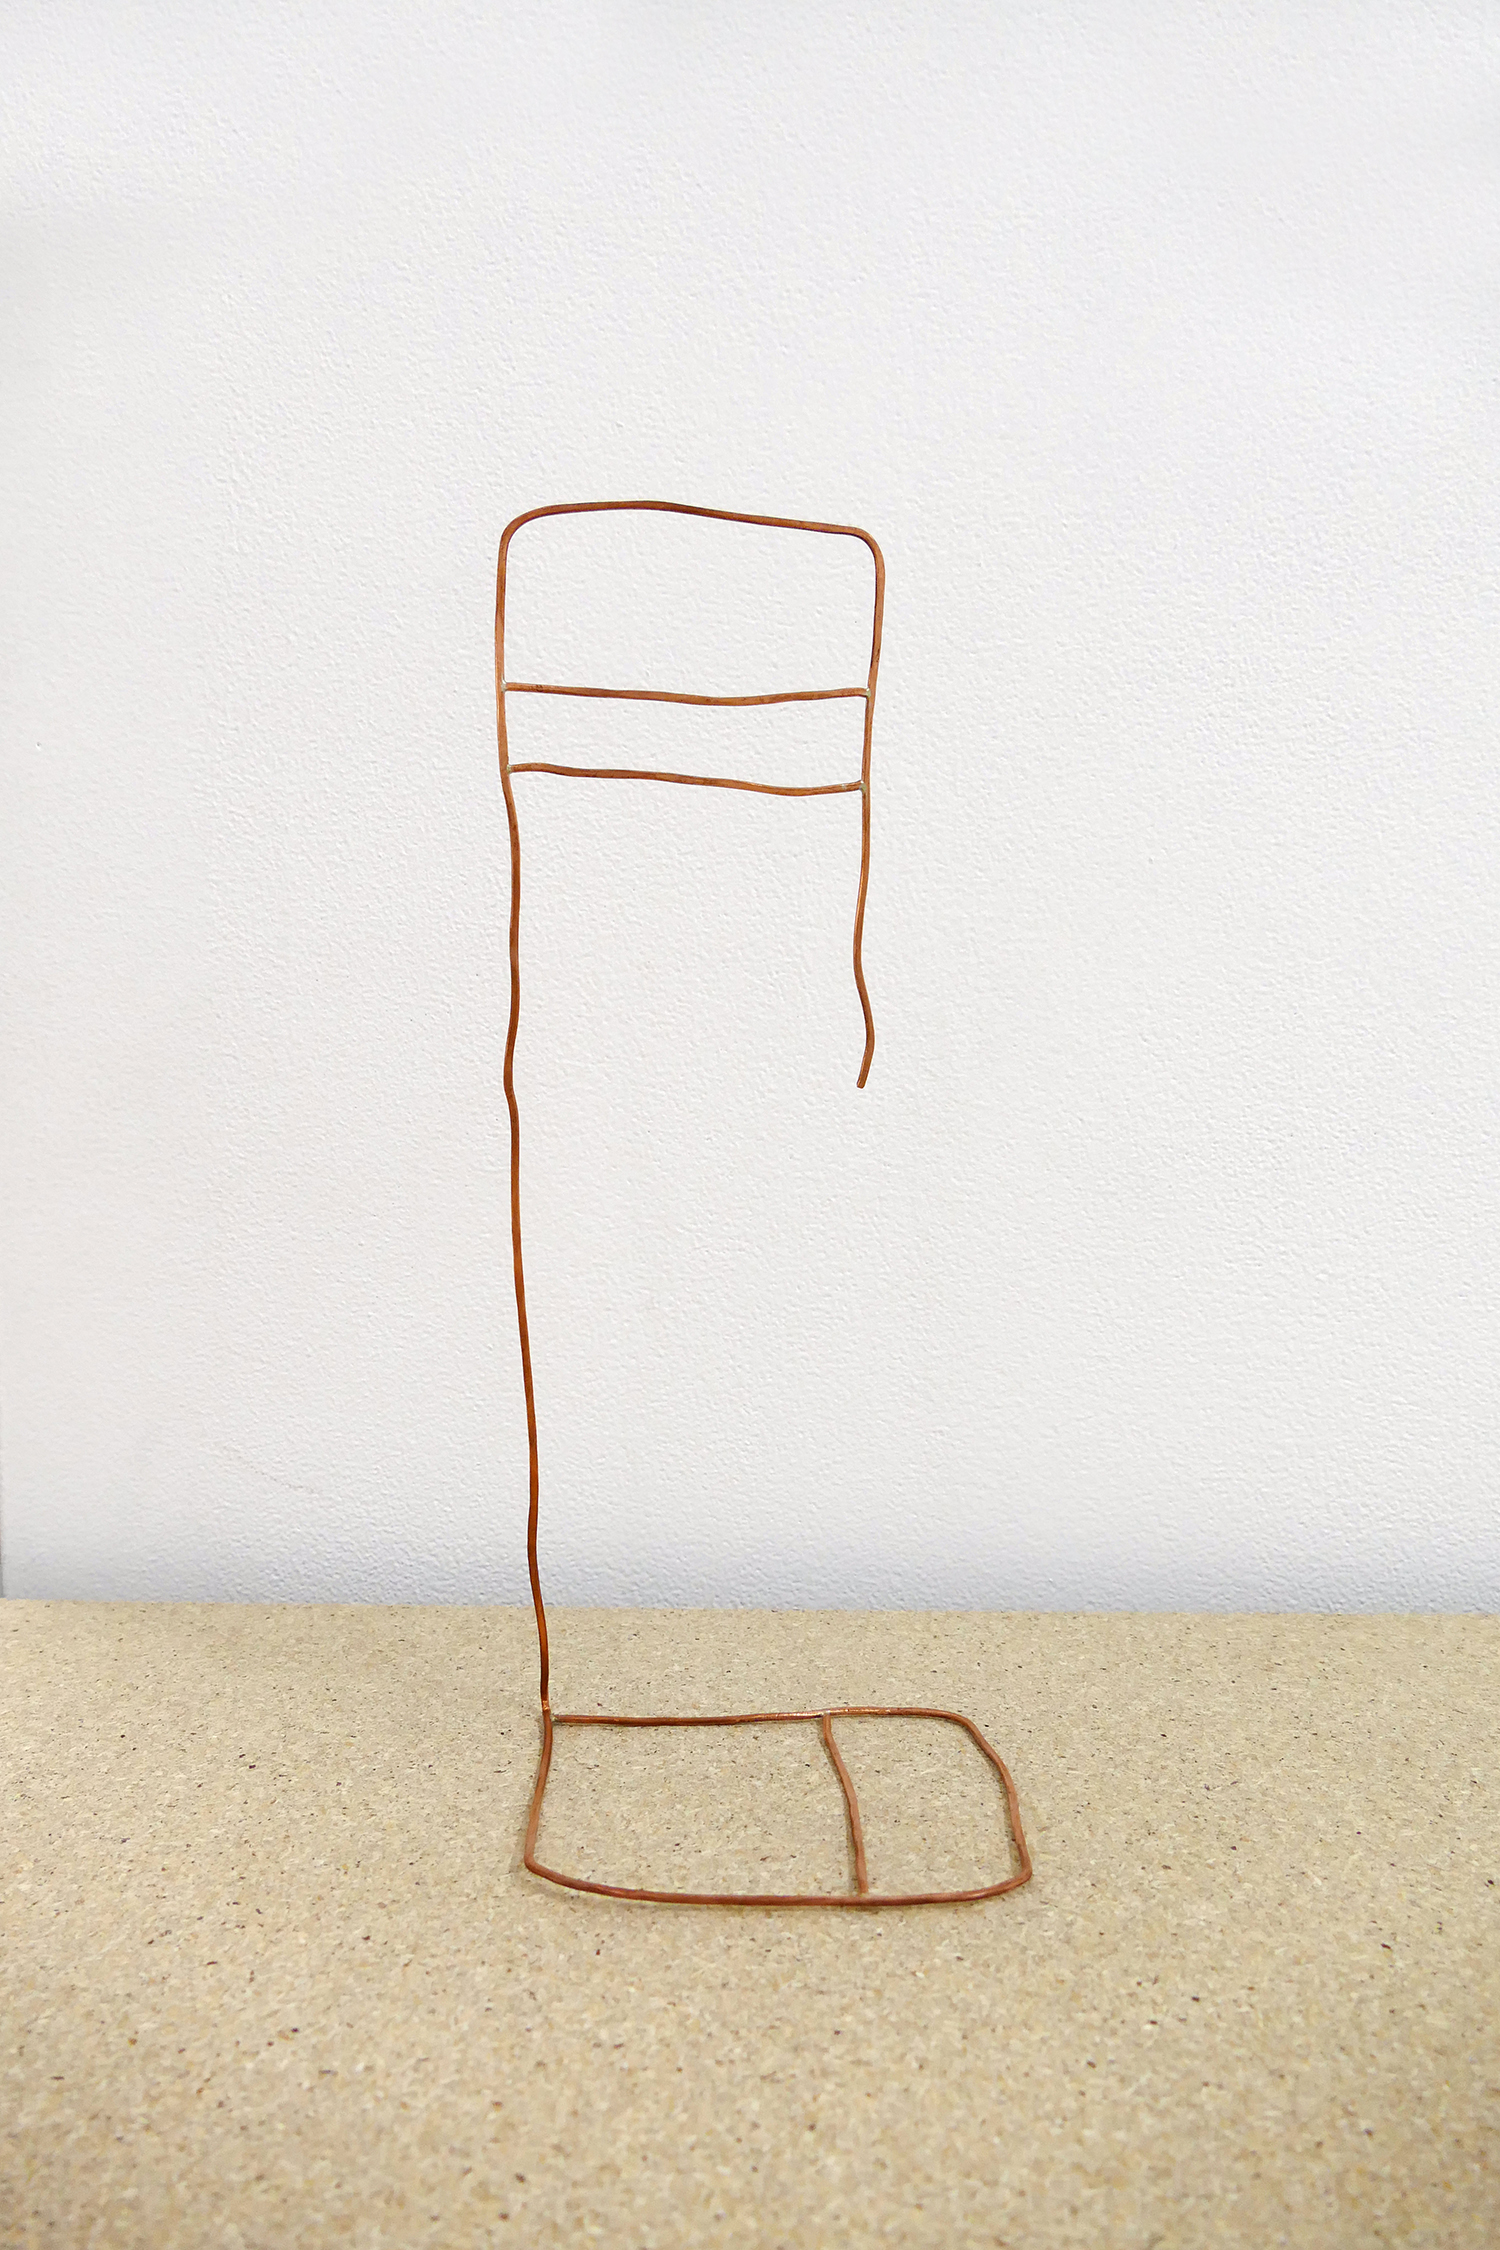 Hardbody Sculpture (Object) XIV